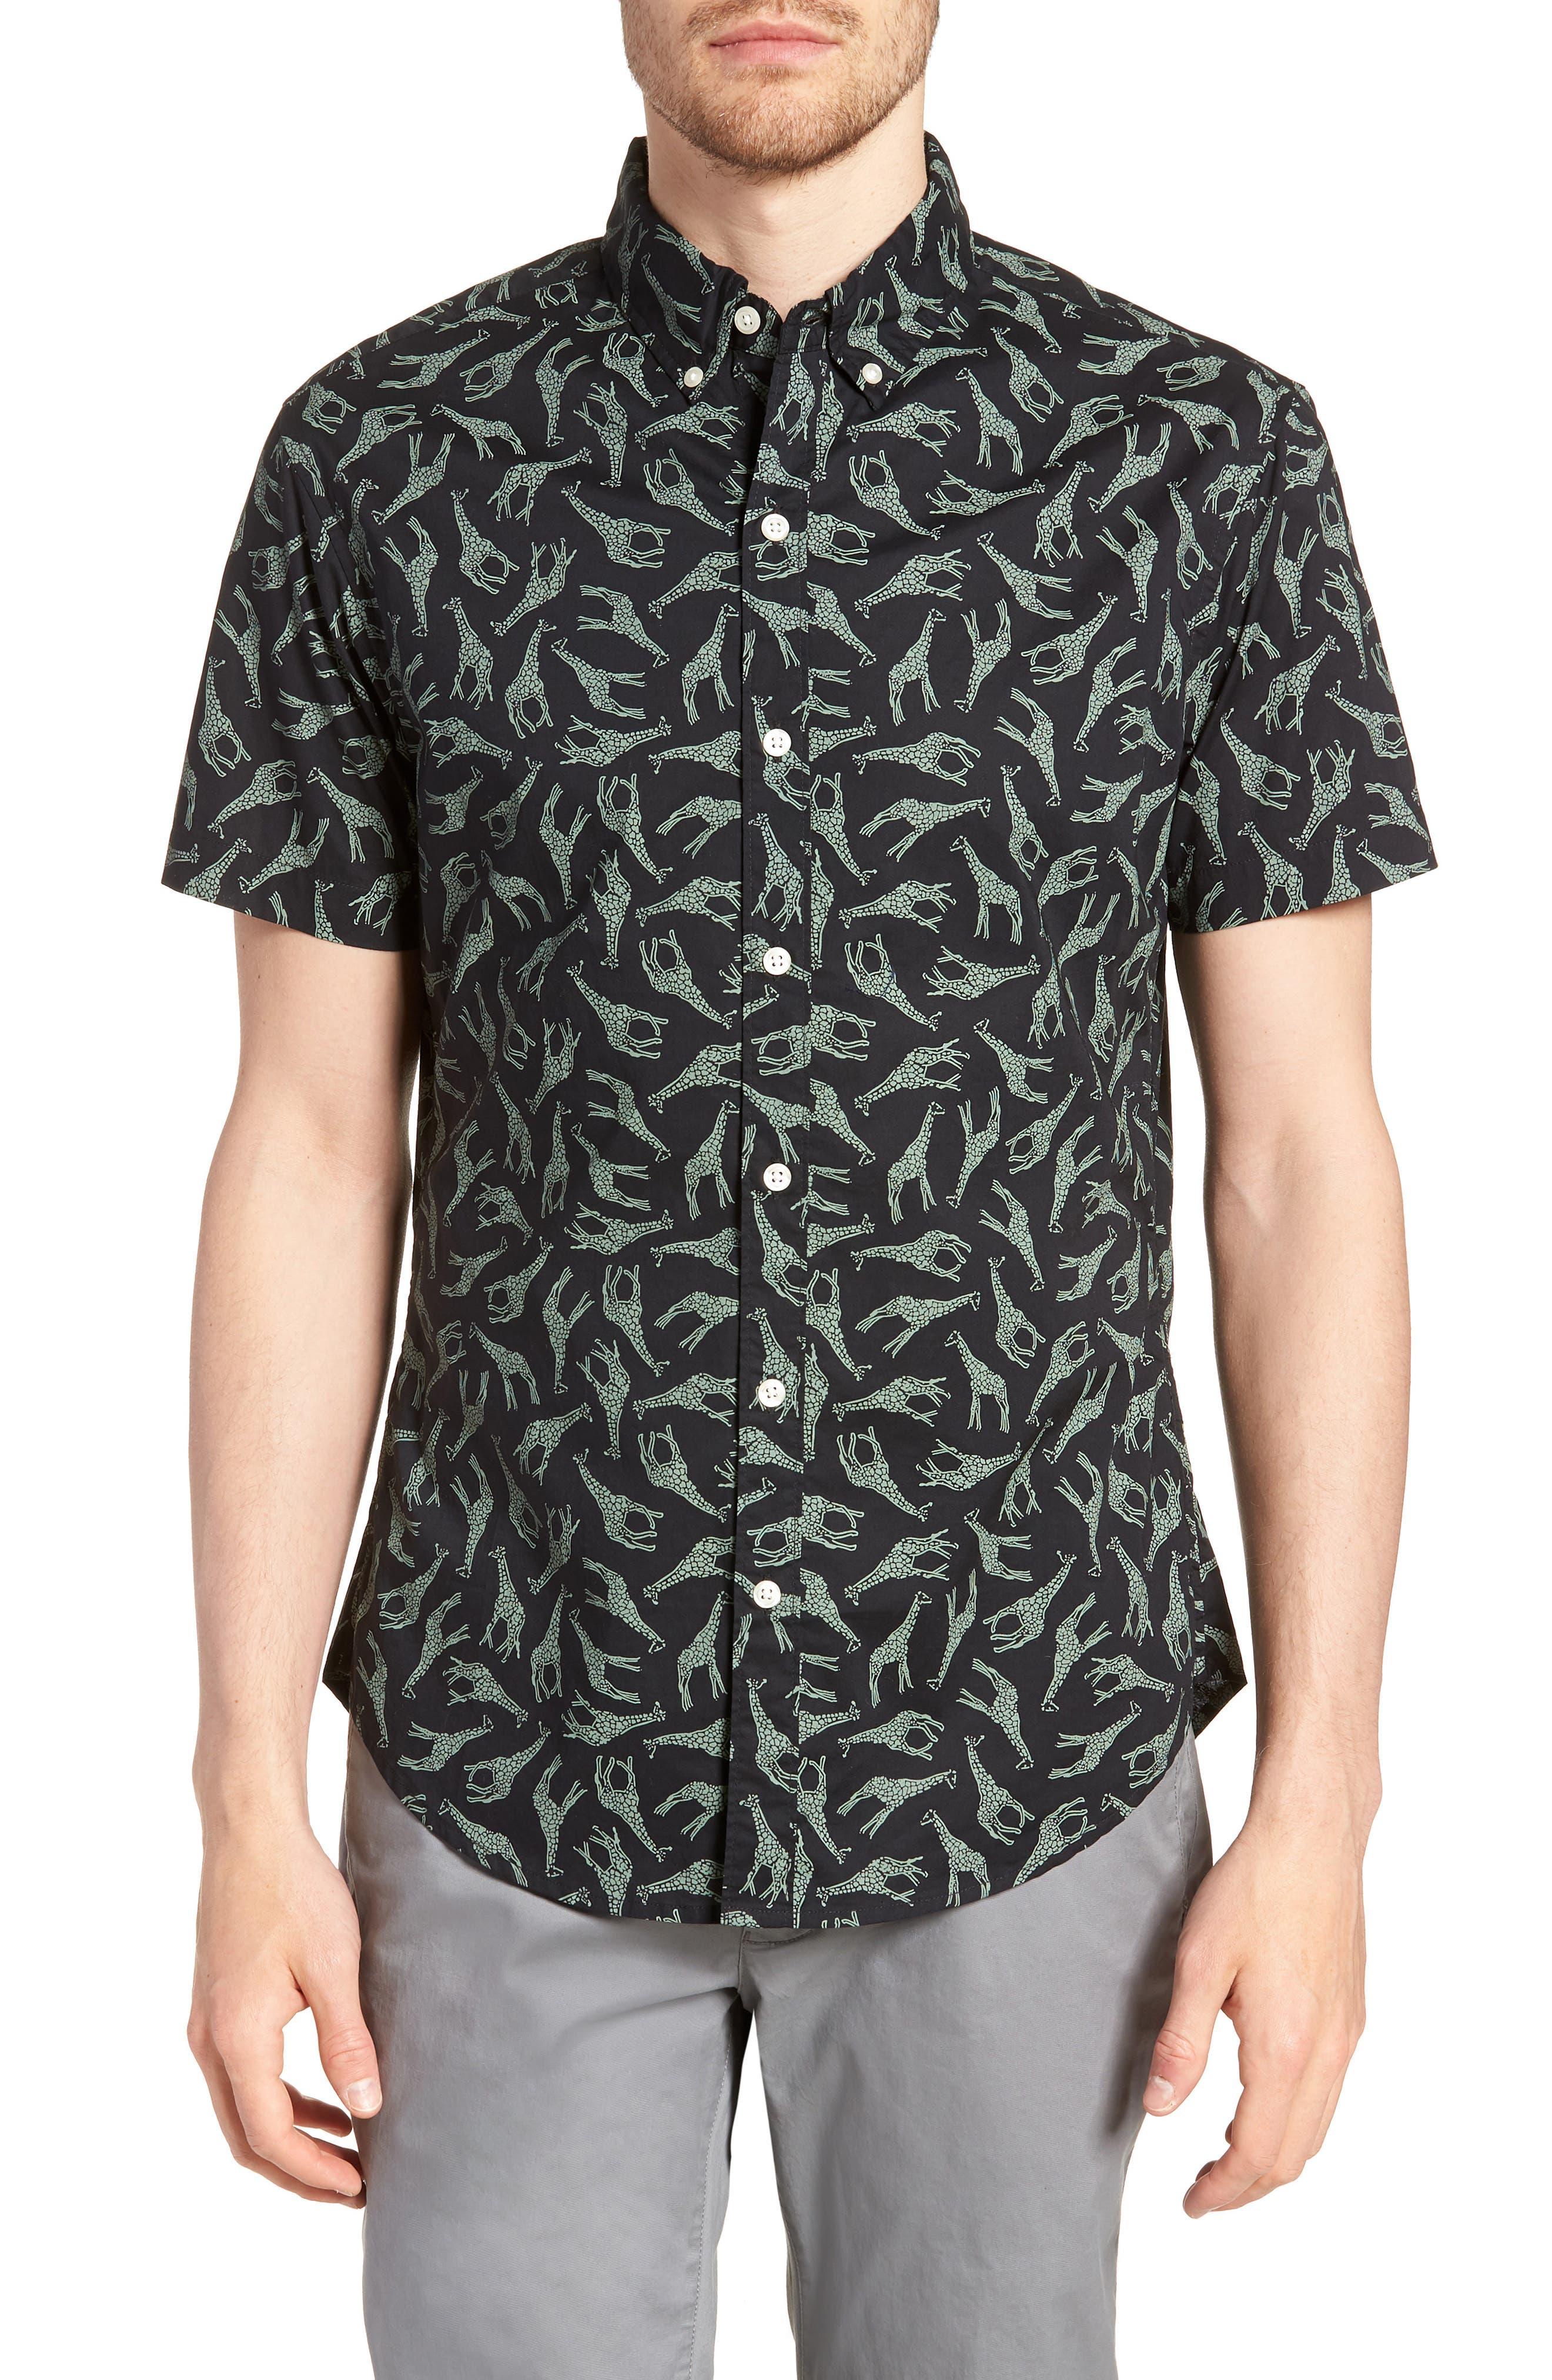 BONOBOS,                             Riviera Slim Fit Giraffe Print Sport Shirt,                             Main thumbnail 1, color,                             001